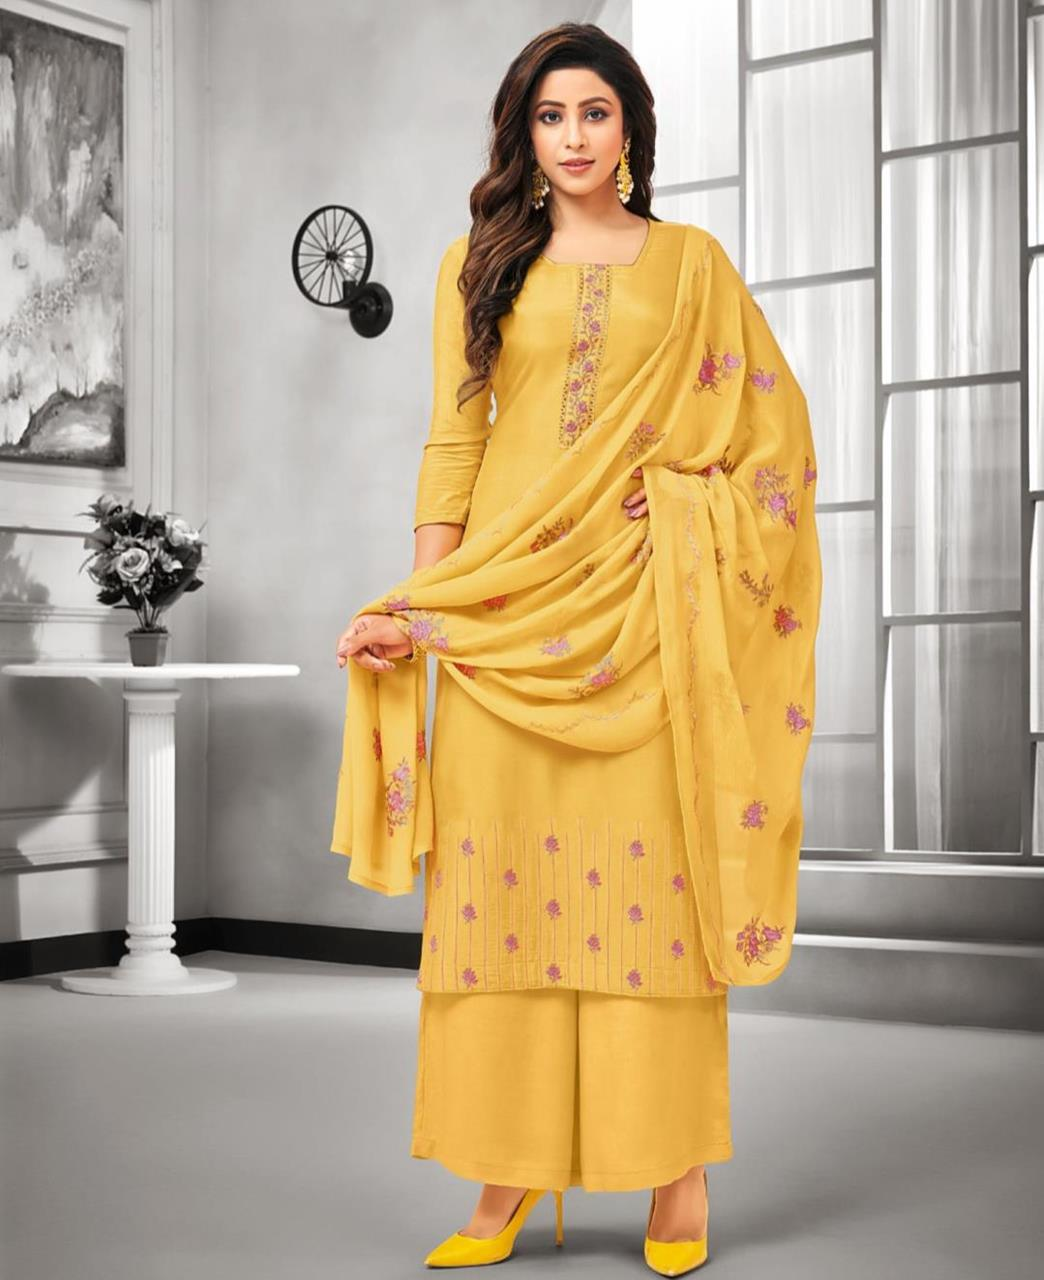 Embroidered Satin Yellow Palazzo Suit Salwar